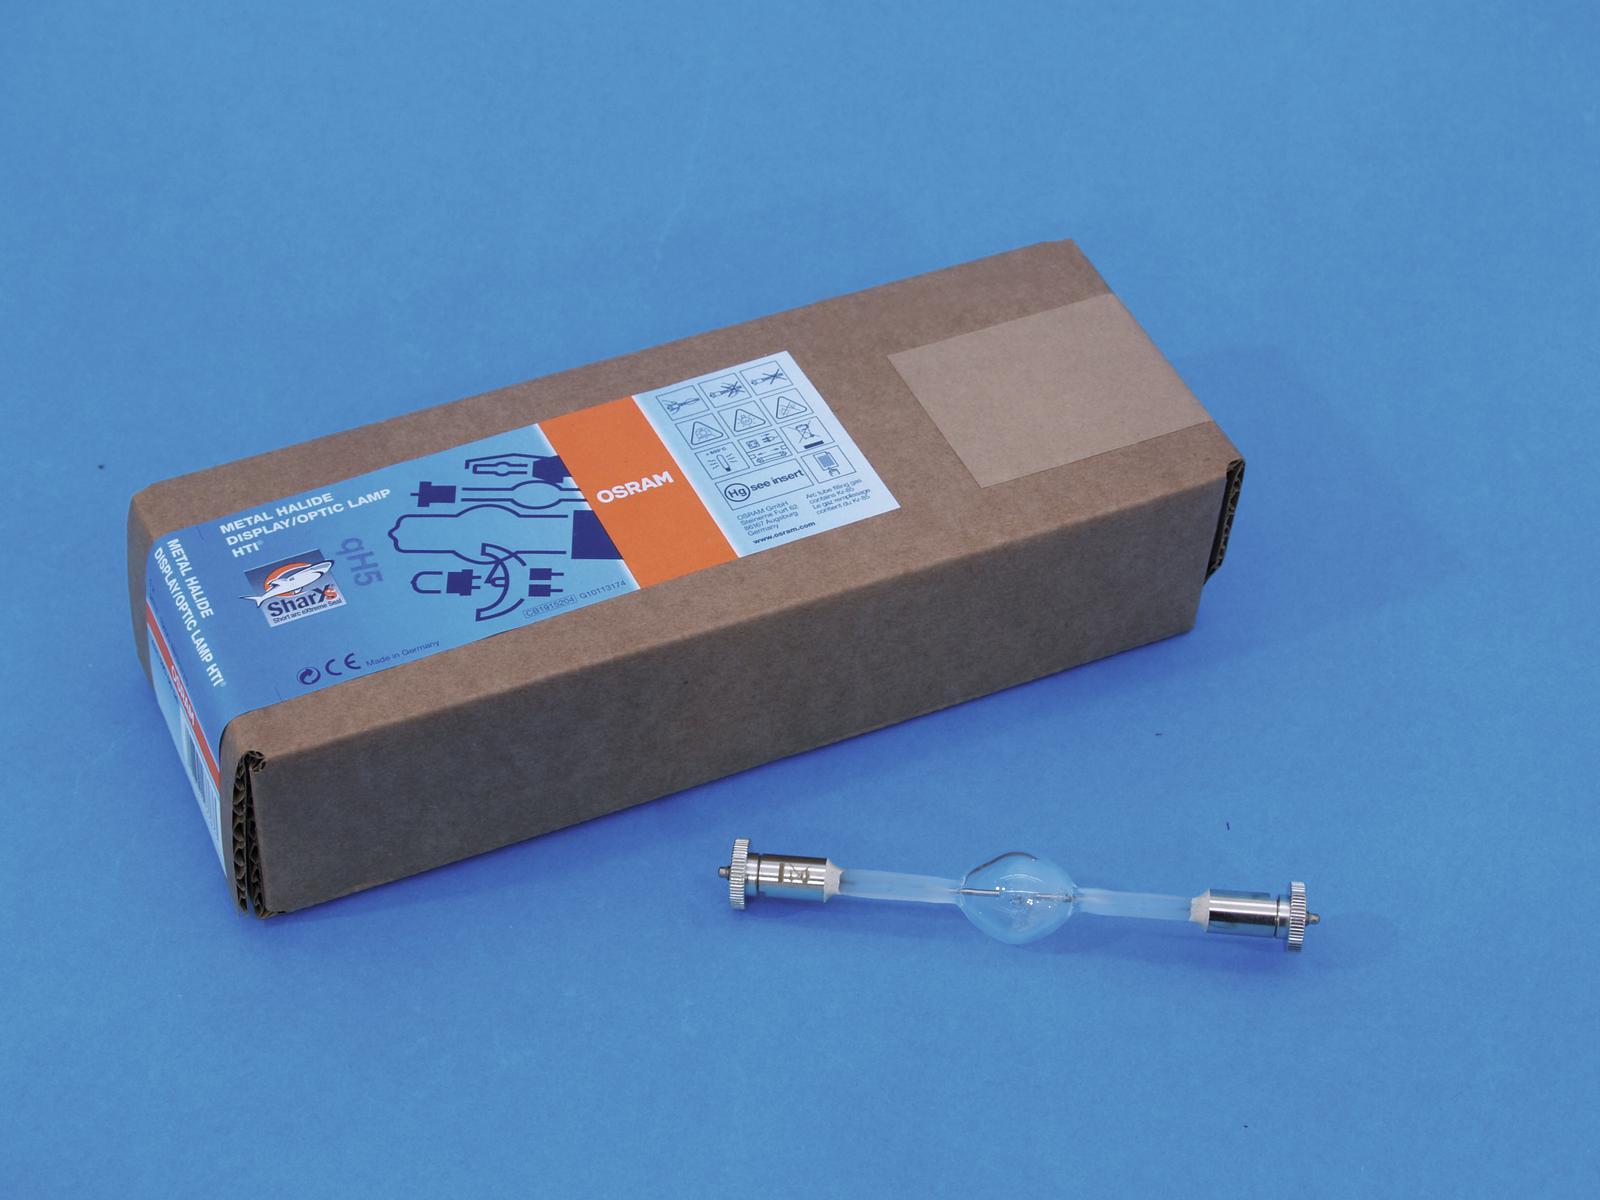 Lampada ad alogenuri metallici SharXS HTI 1200W/D7/75 750h OSRAM